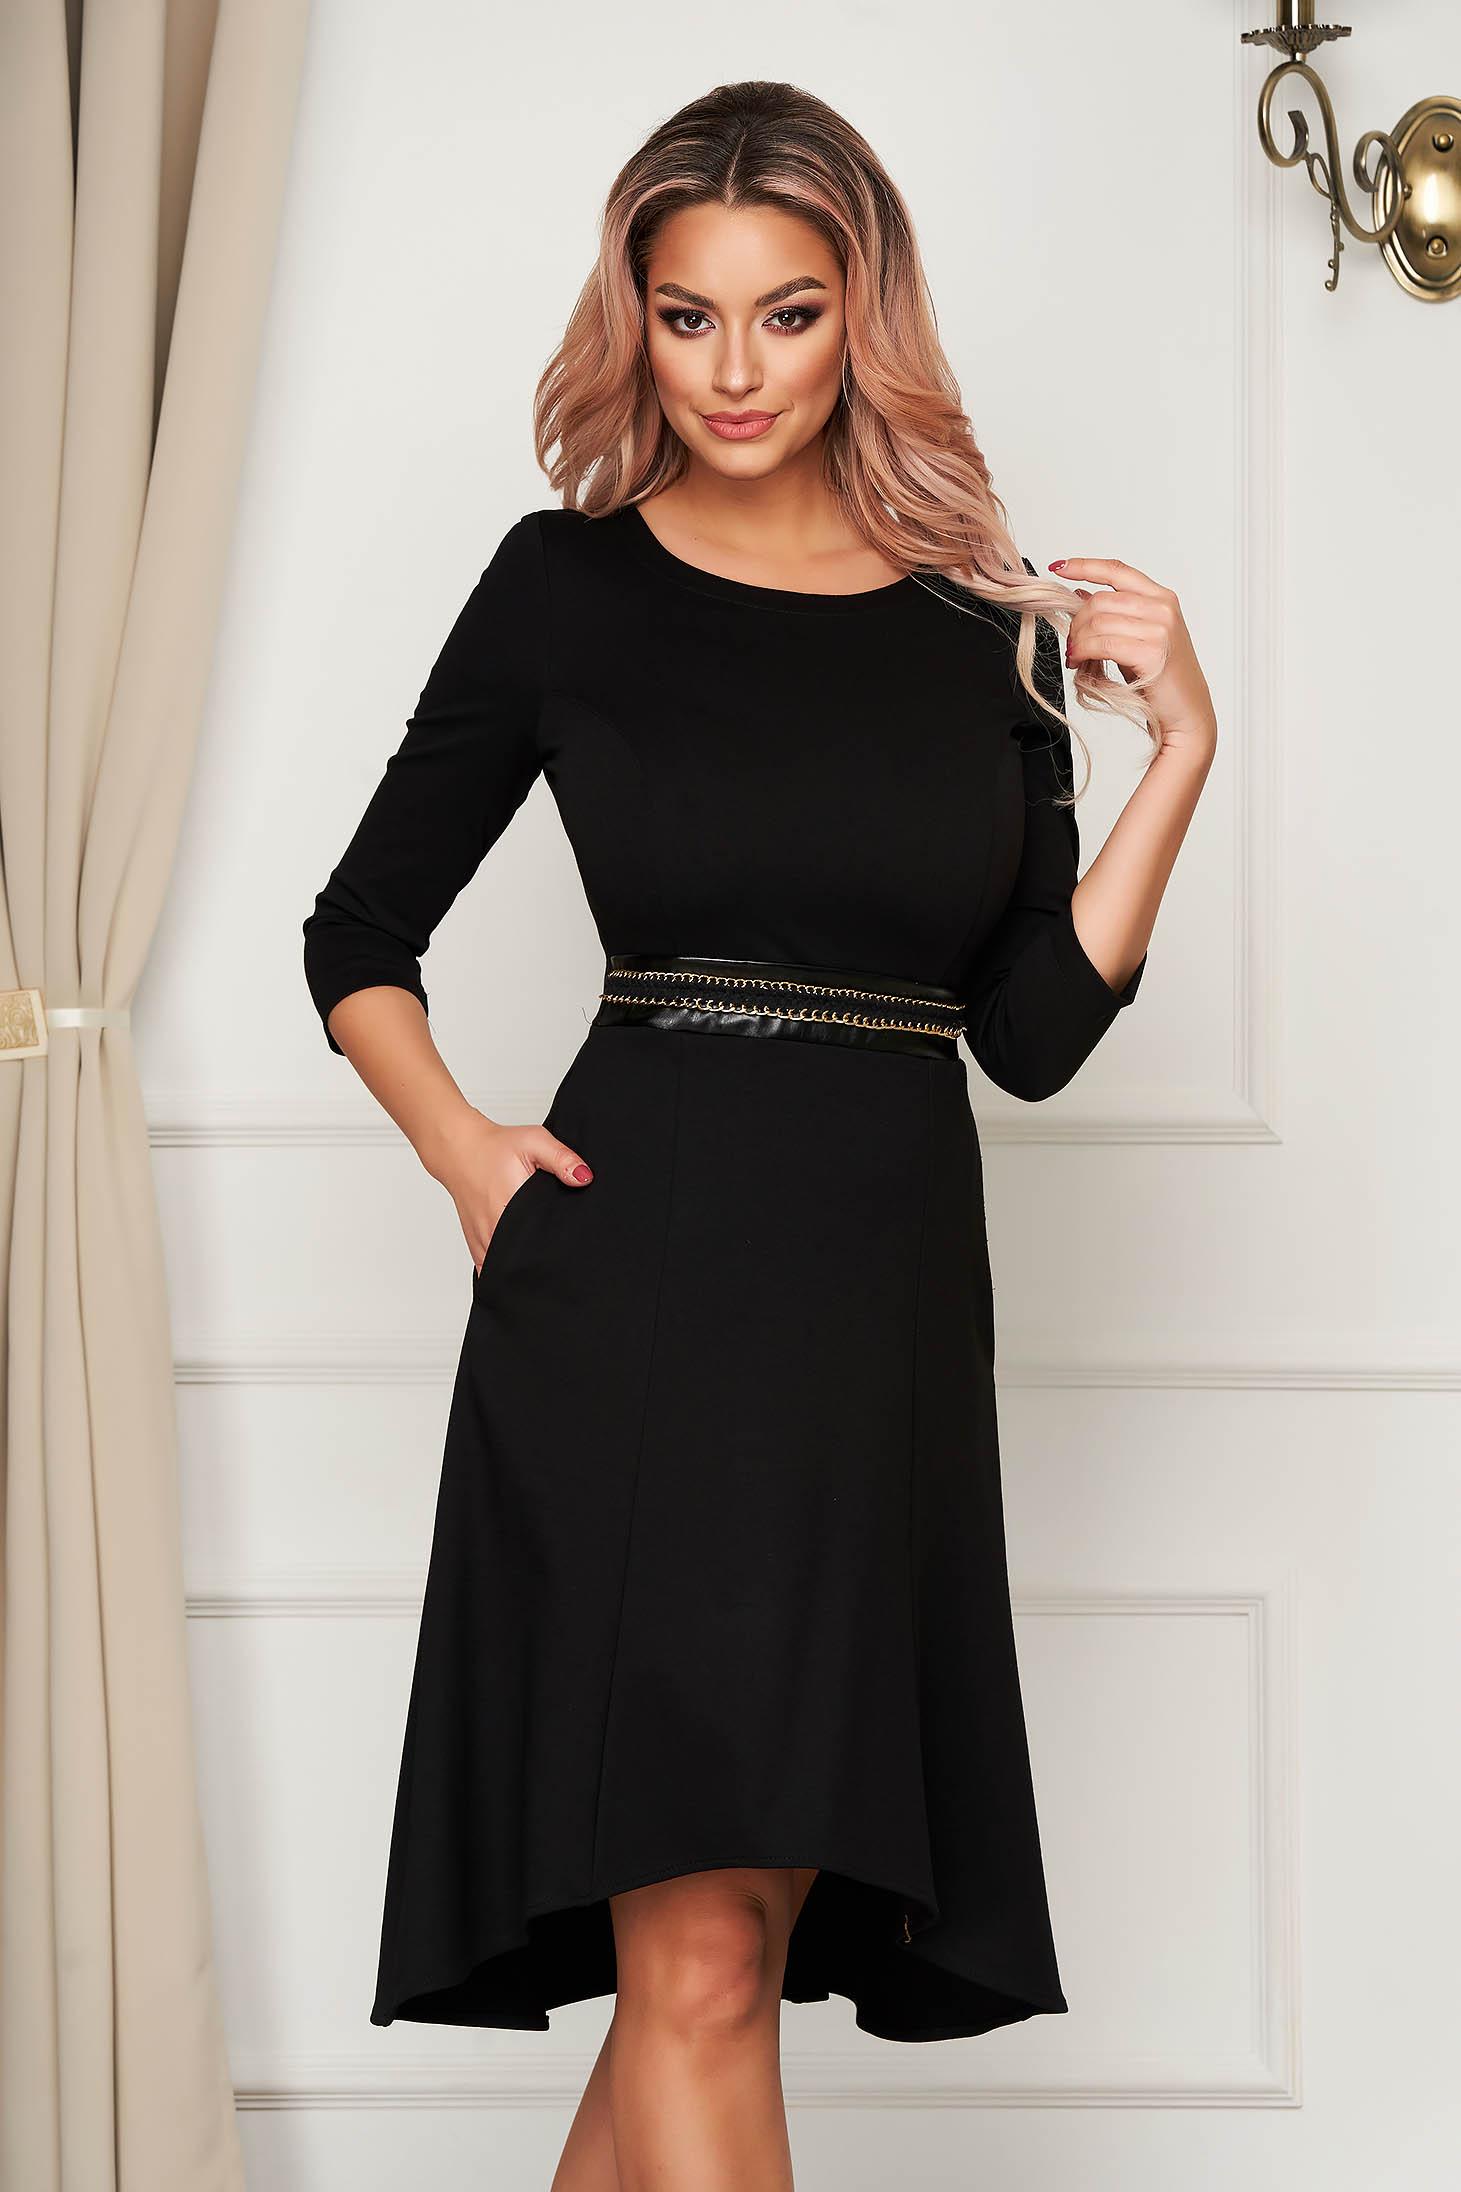 Rochie StarShinerS neagra asimetrica de zi din jersey cu buzunare si centura decorativa